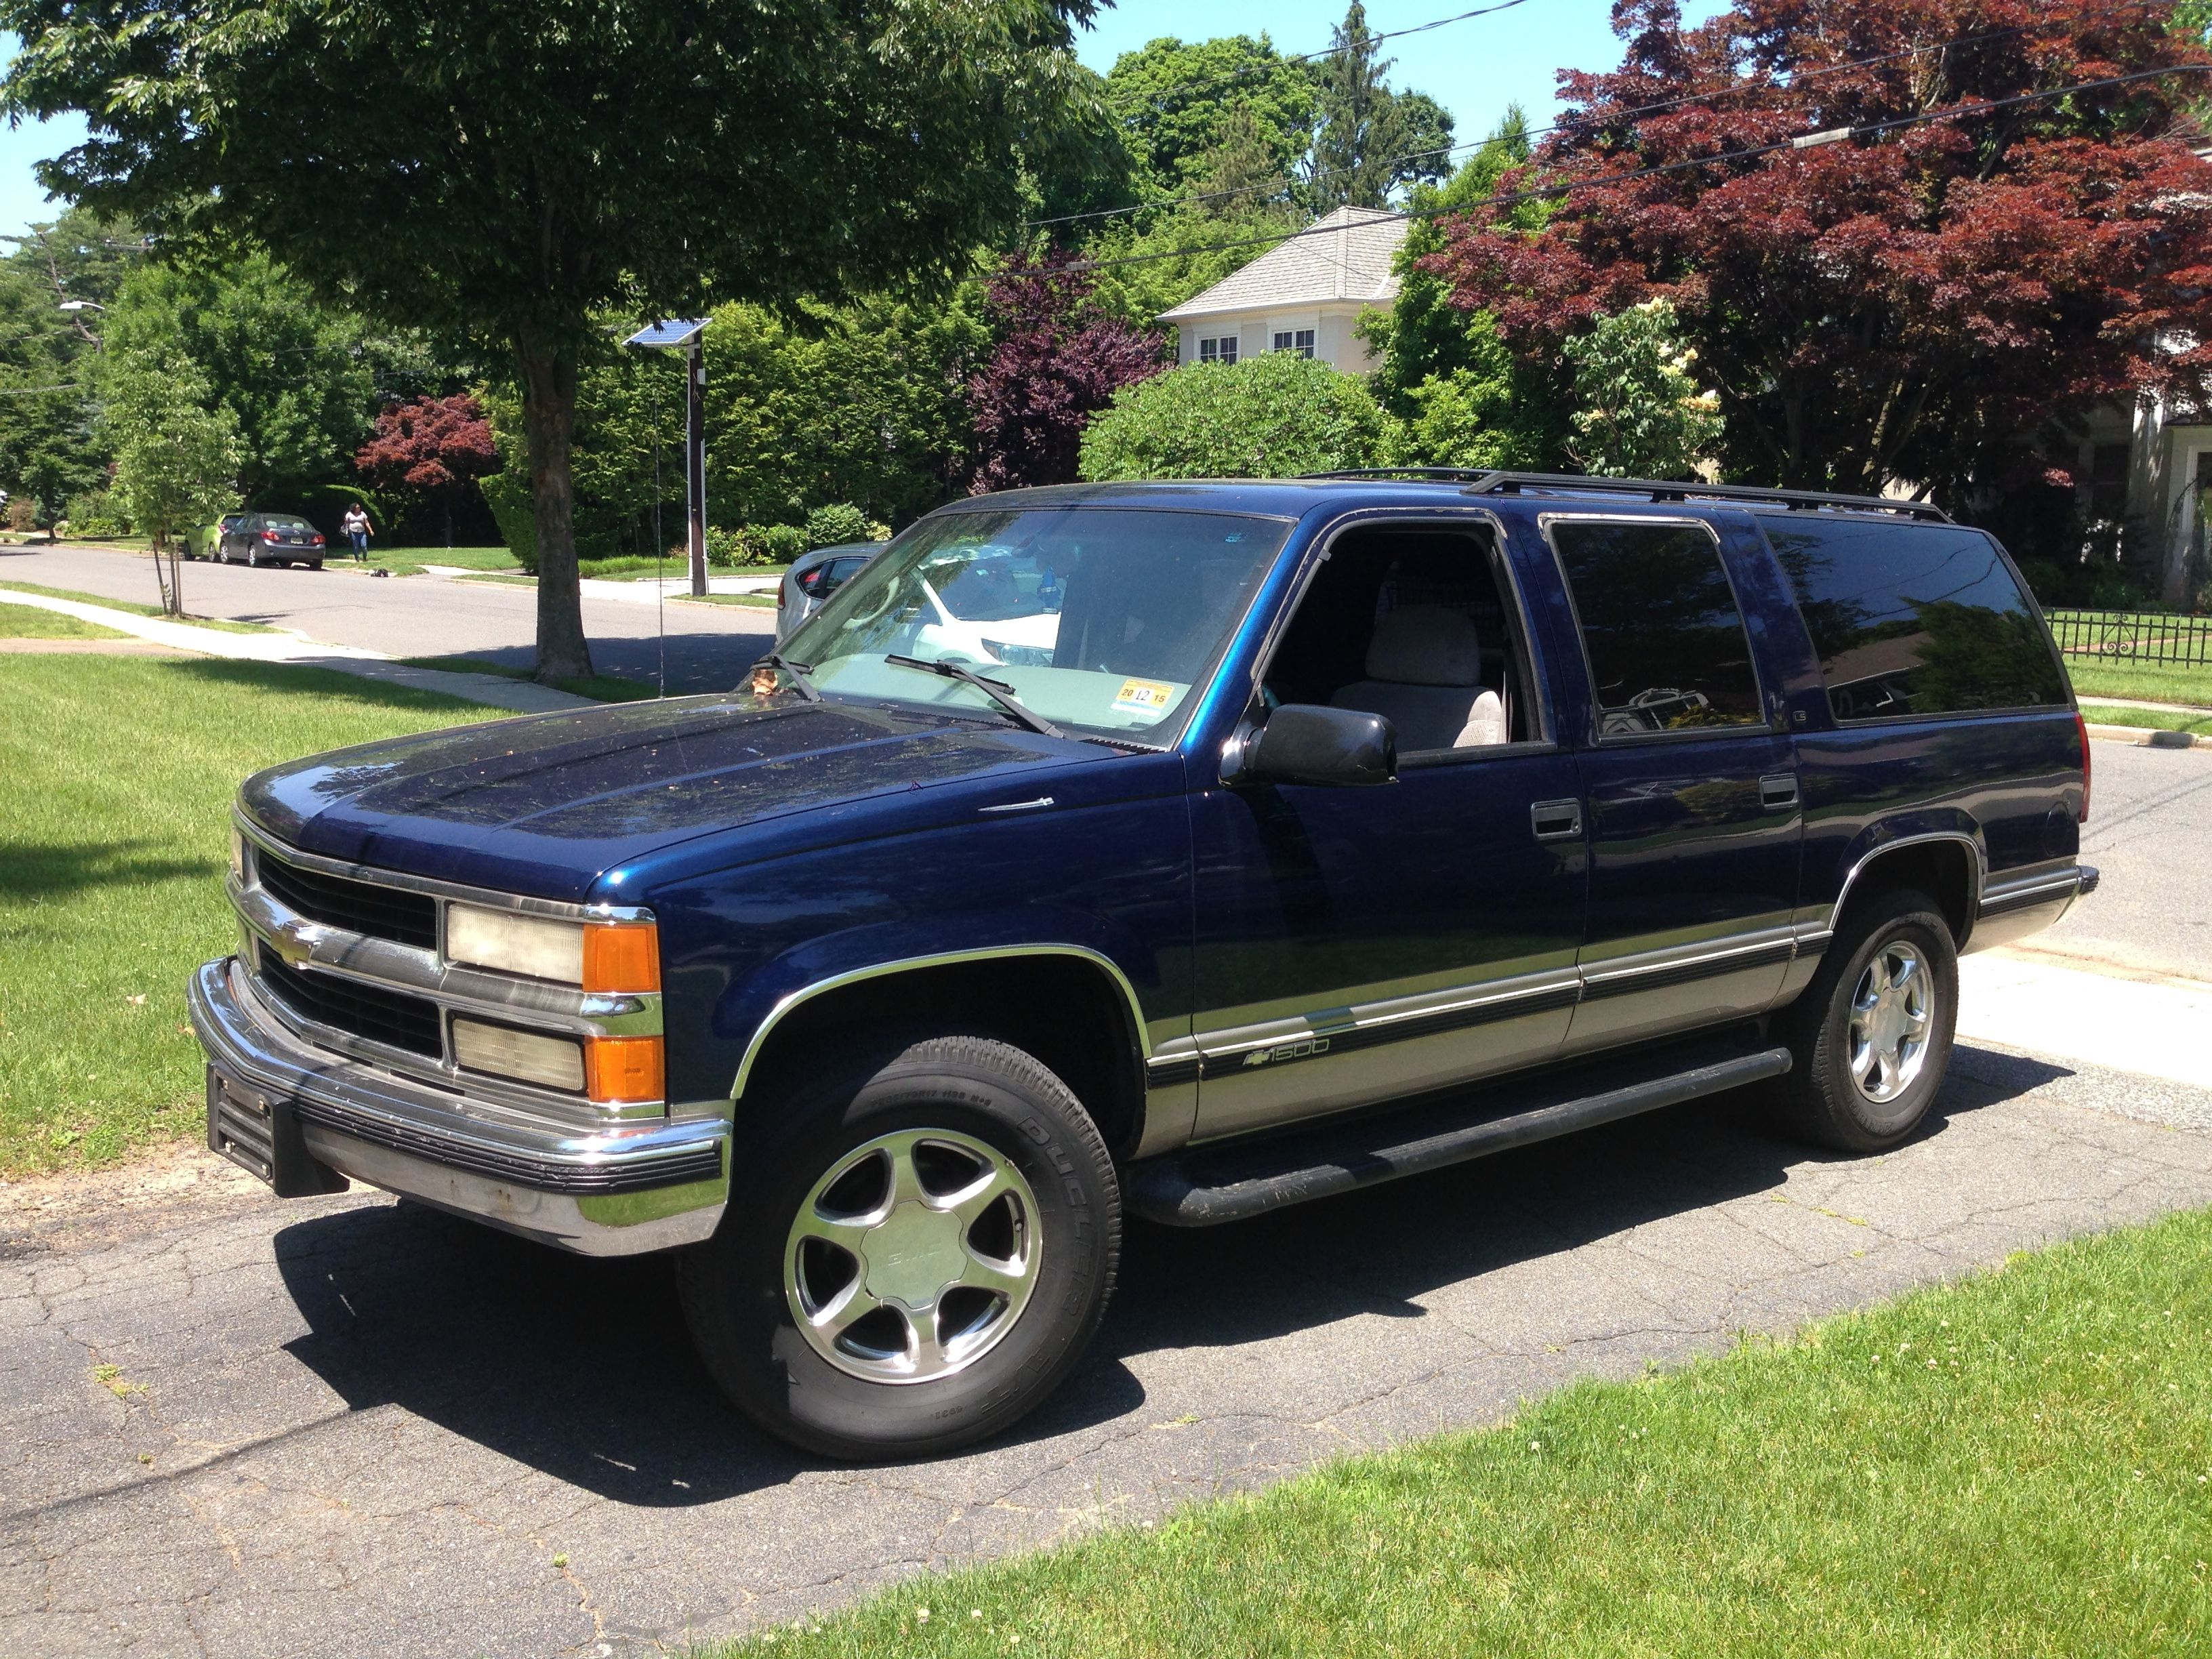 medium resolution of 99 suburban 5 7l vortec v8 no rust clean interior only 115k miles still for sale